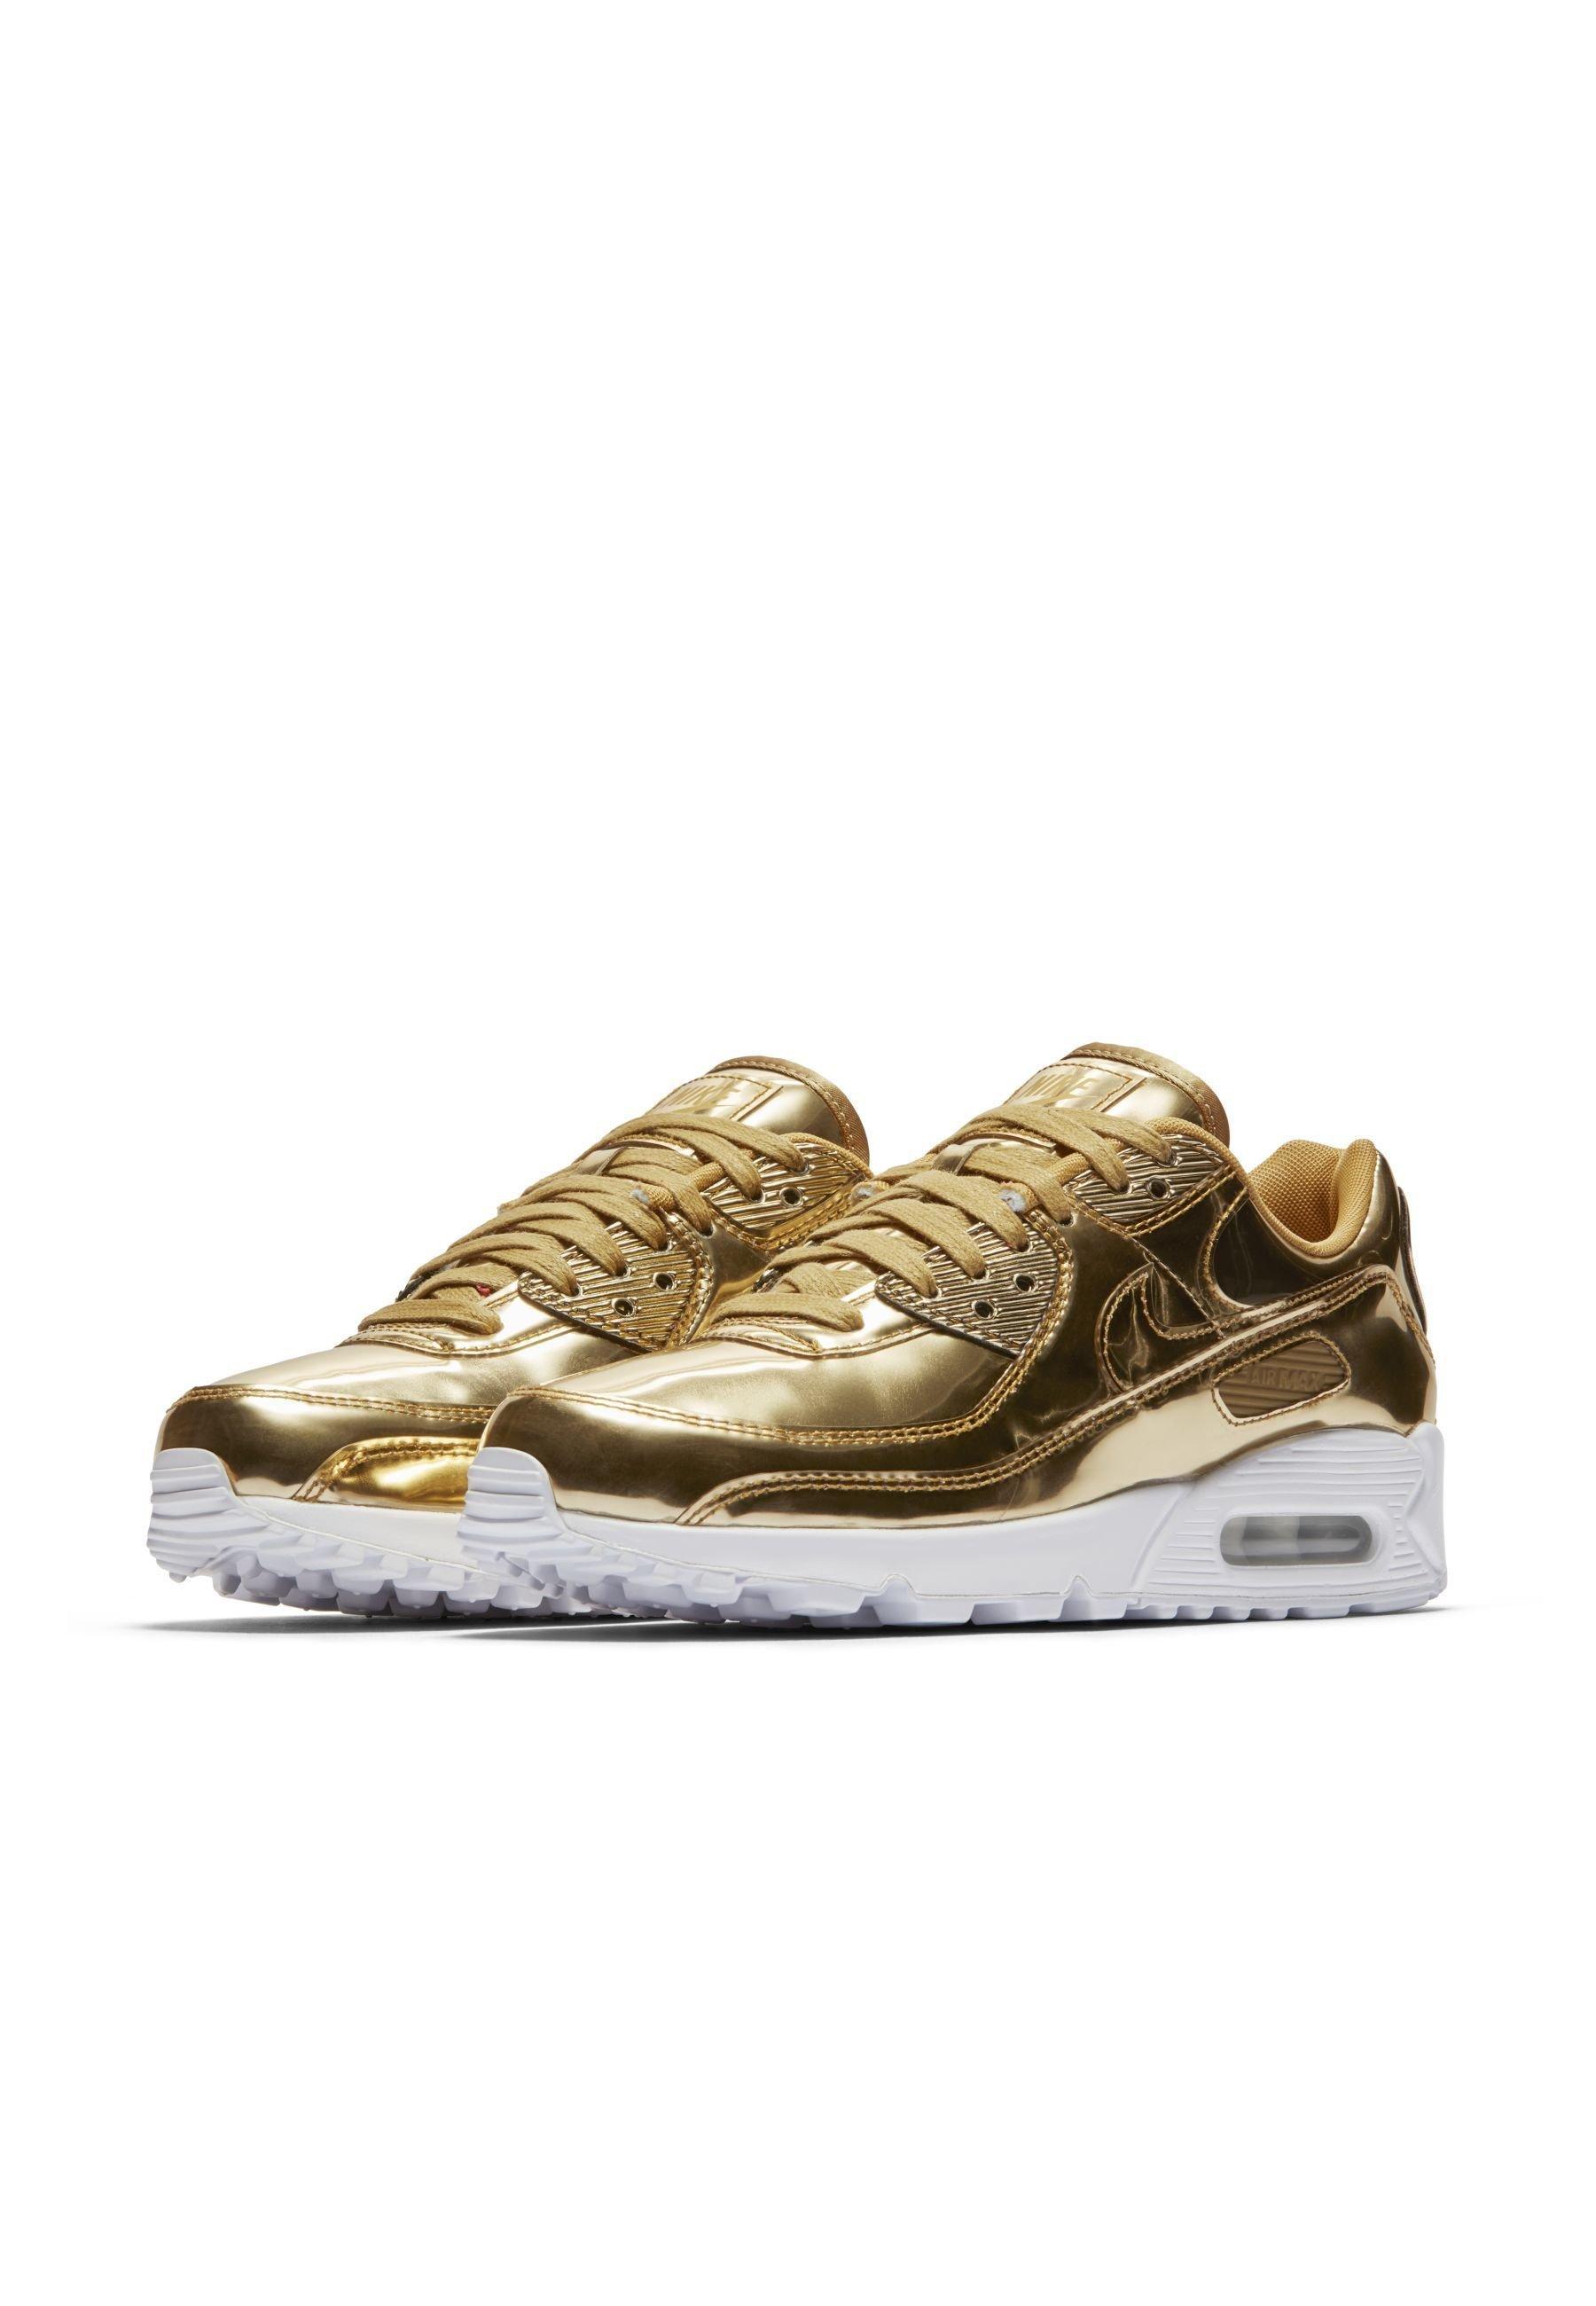 air max 90 homme gold